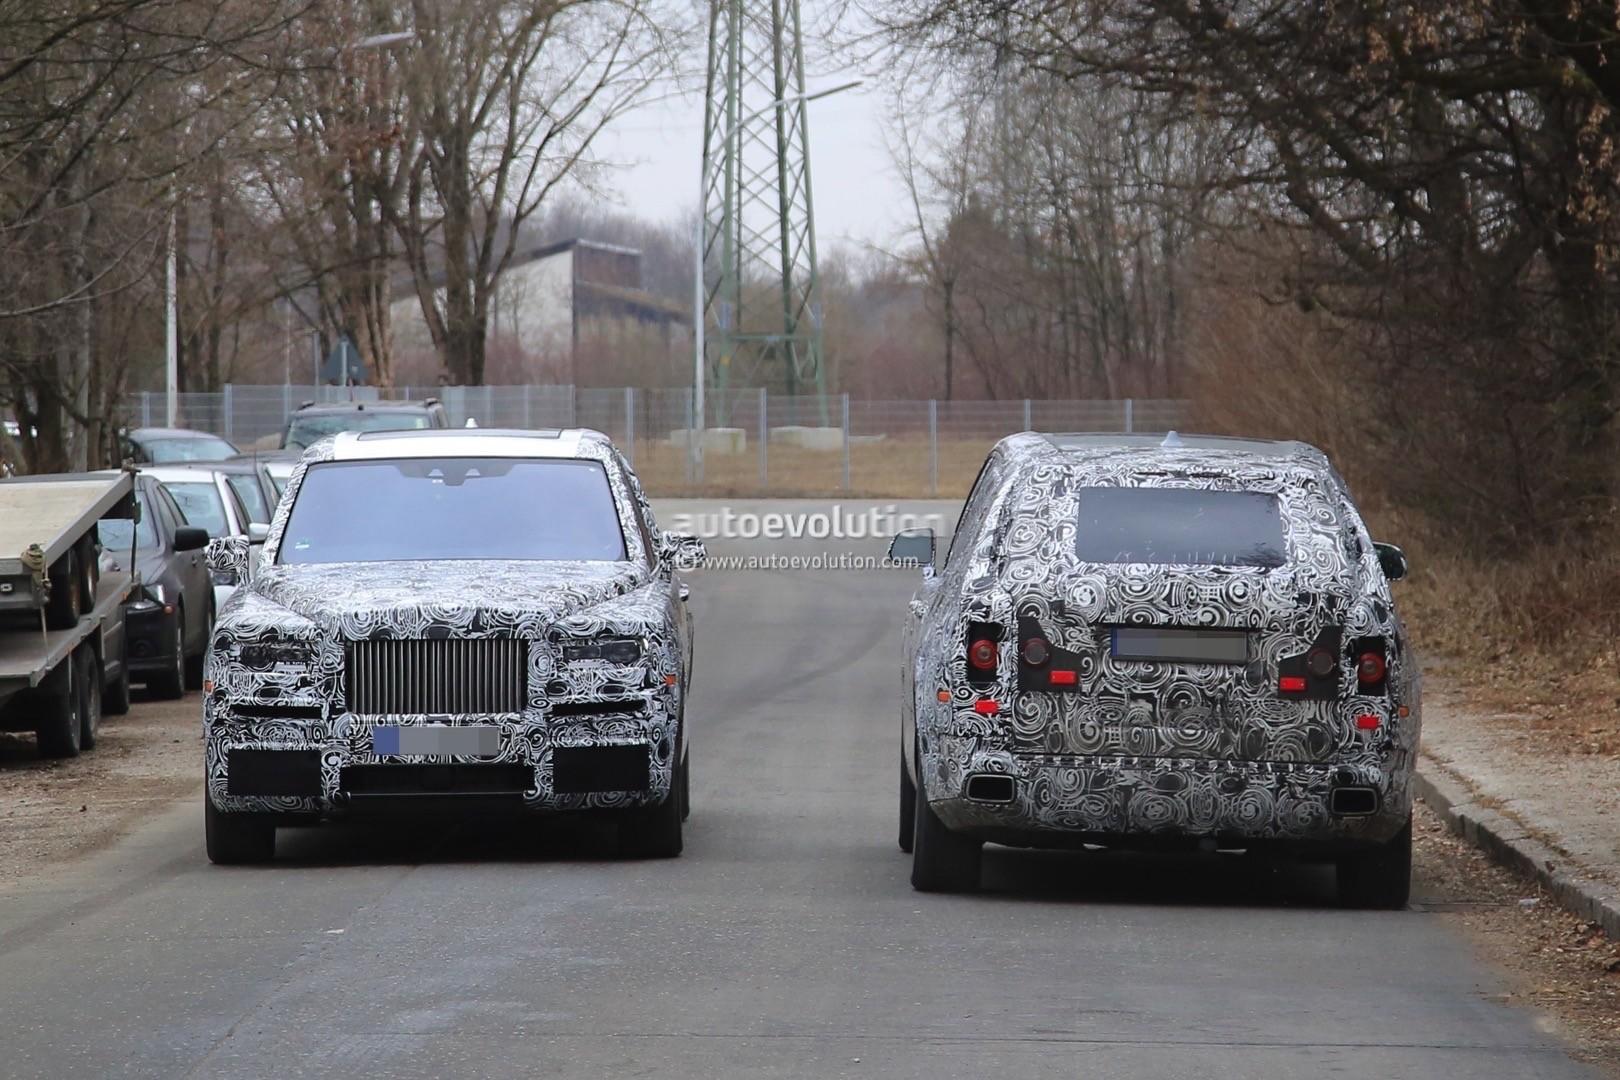 2018 Rolls Royce Cullinan Spied Once Again Looks Massive